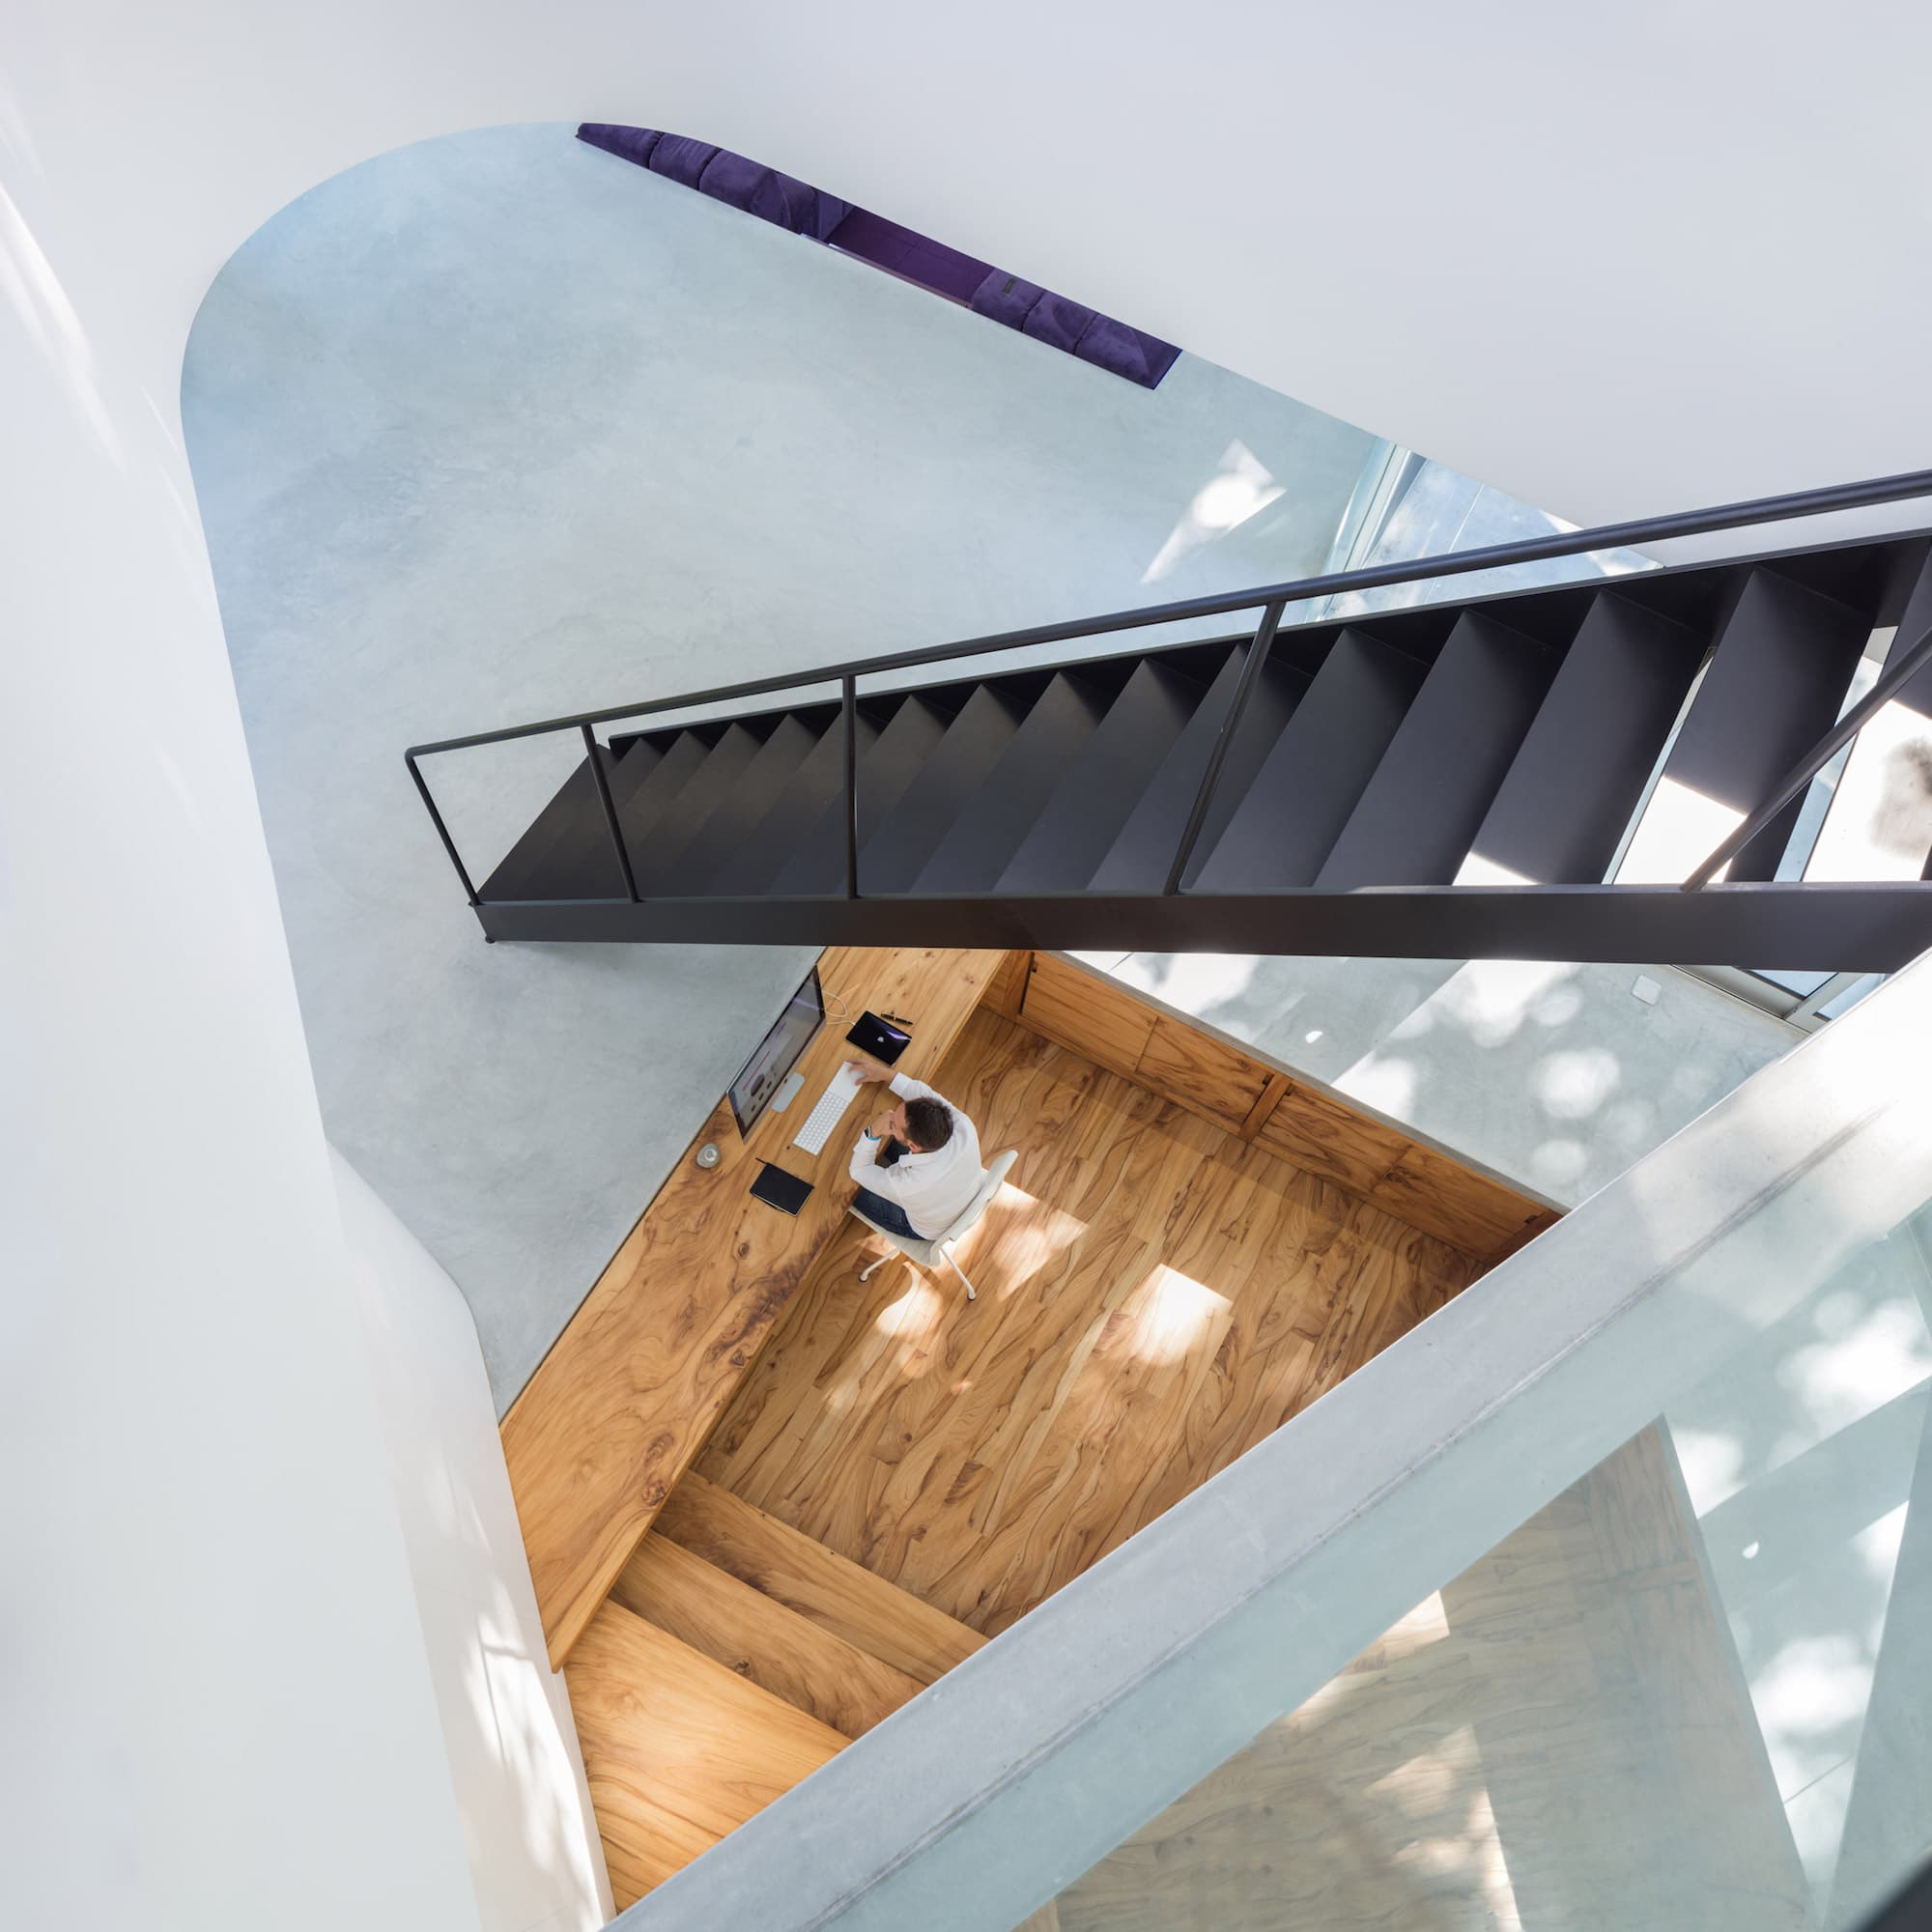 Licht ist Leben: Pam & Paul's House by Craig Steely Architecture 5